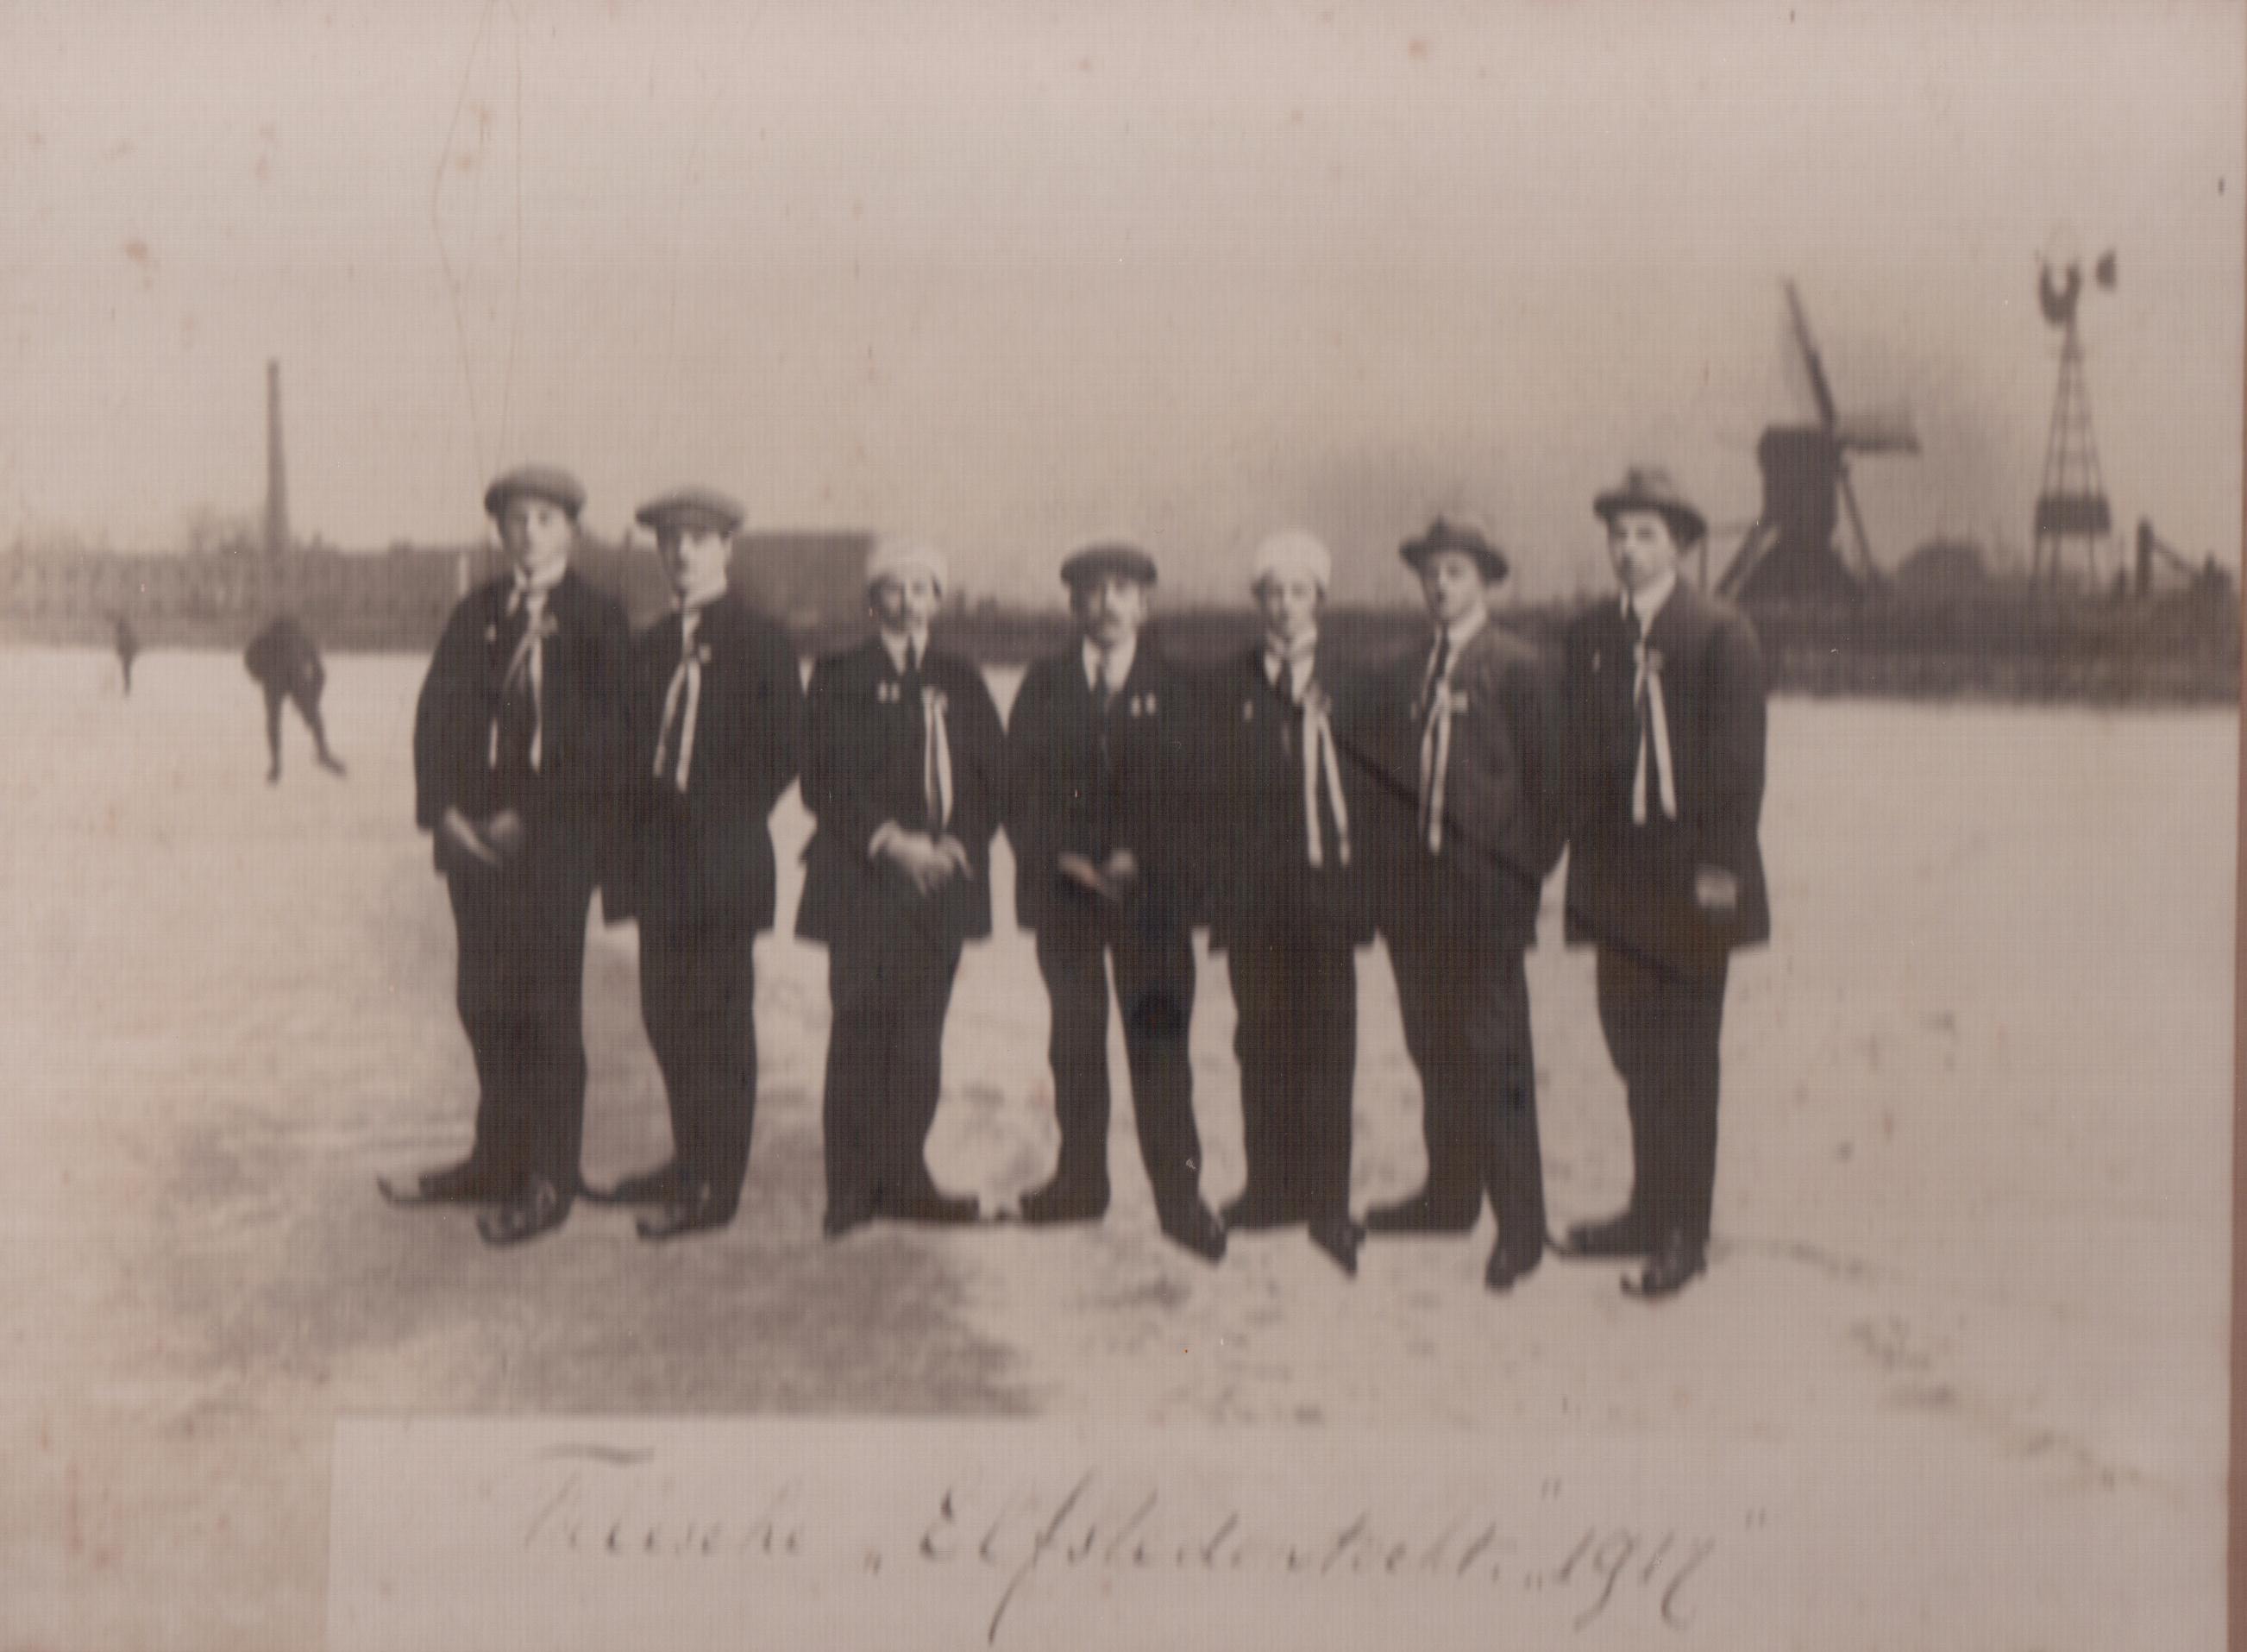 werff-ytzen-piters-maten-alvestedetocht-1917